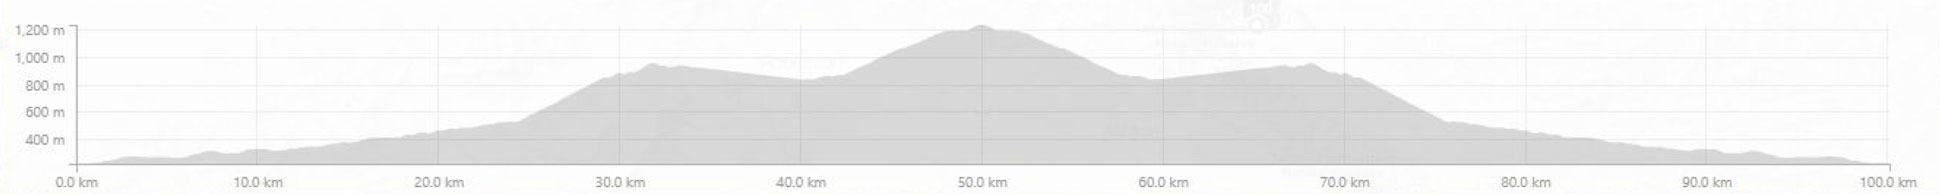 Day 1 elevation